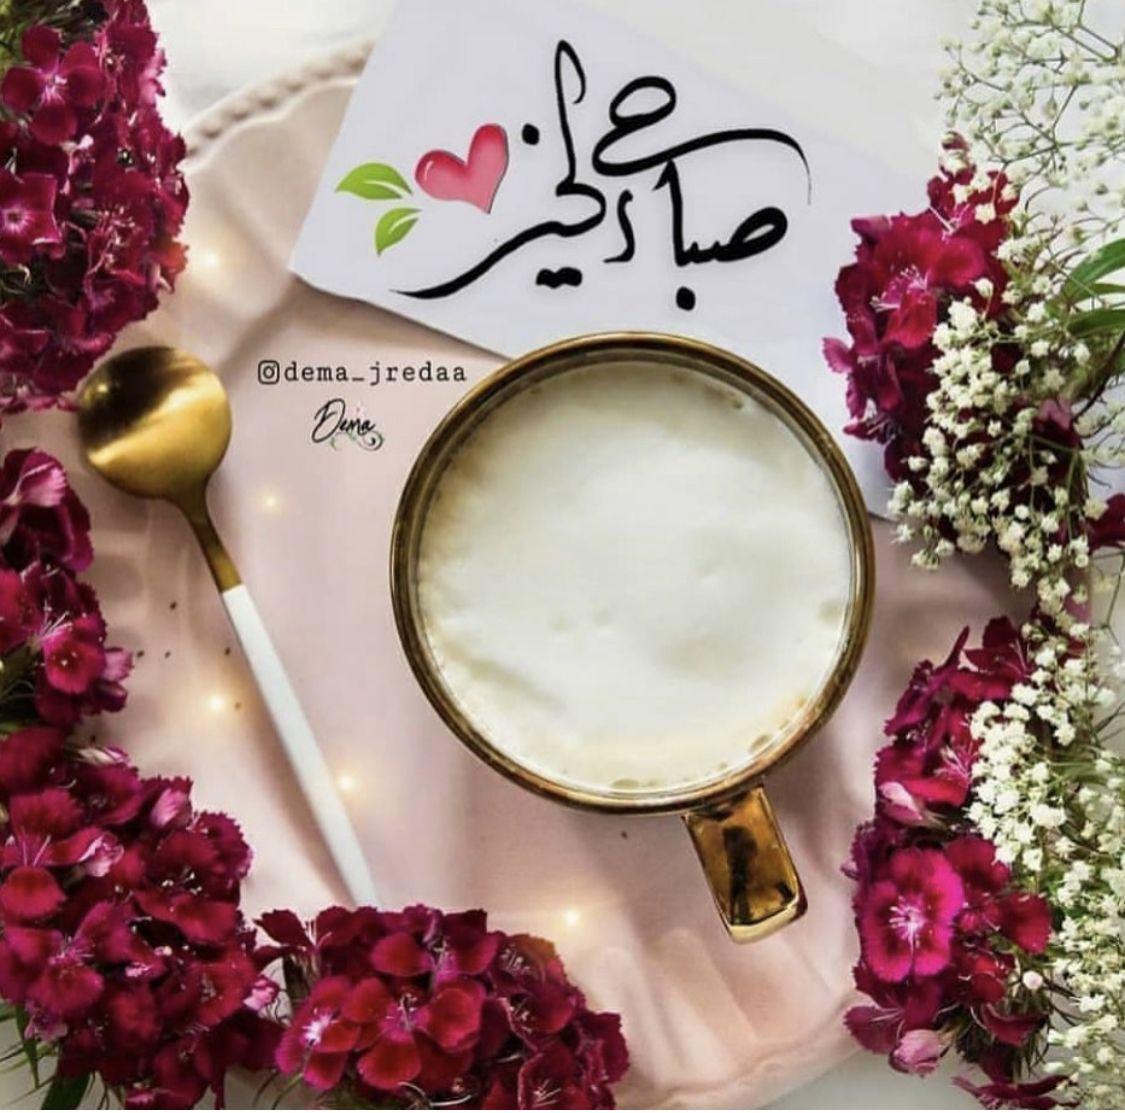 صباح الخير Aesthetic Iphone Wallpaper Morning Greeting Quran Quotes Inspirational